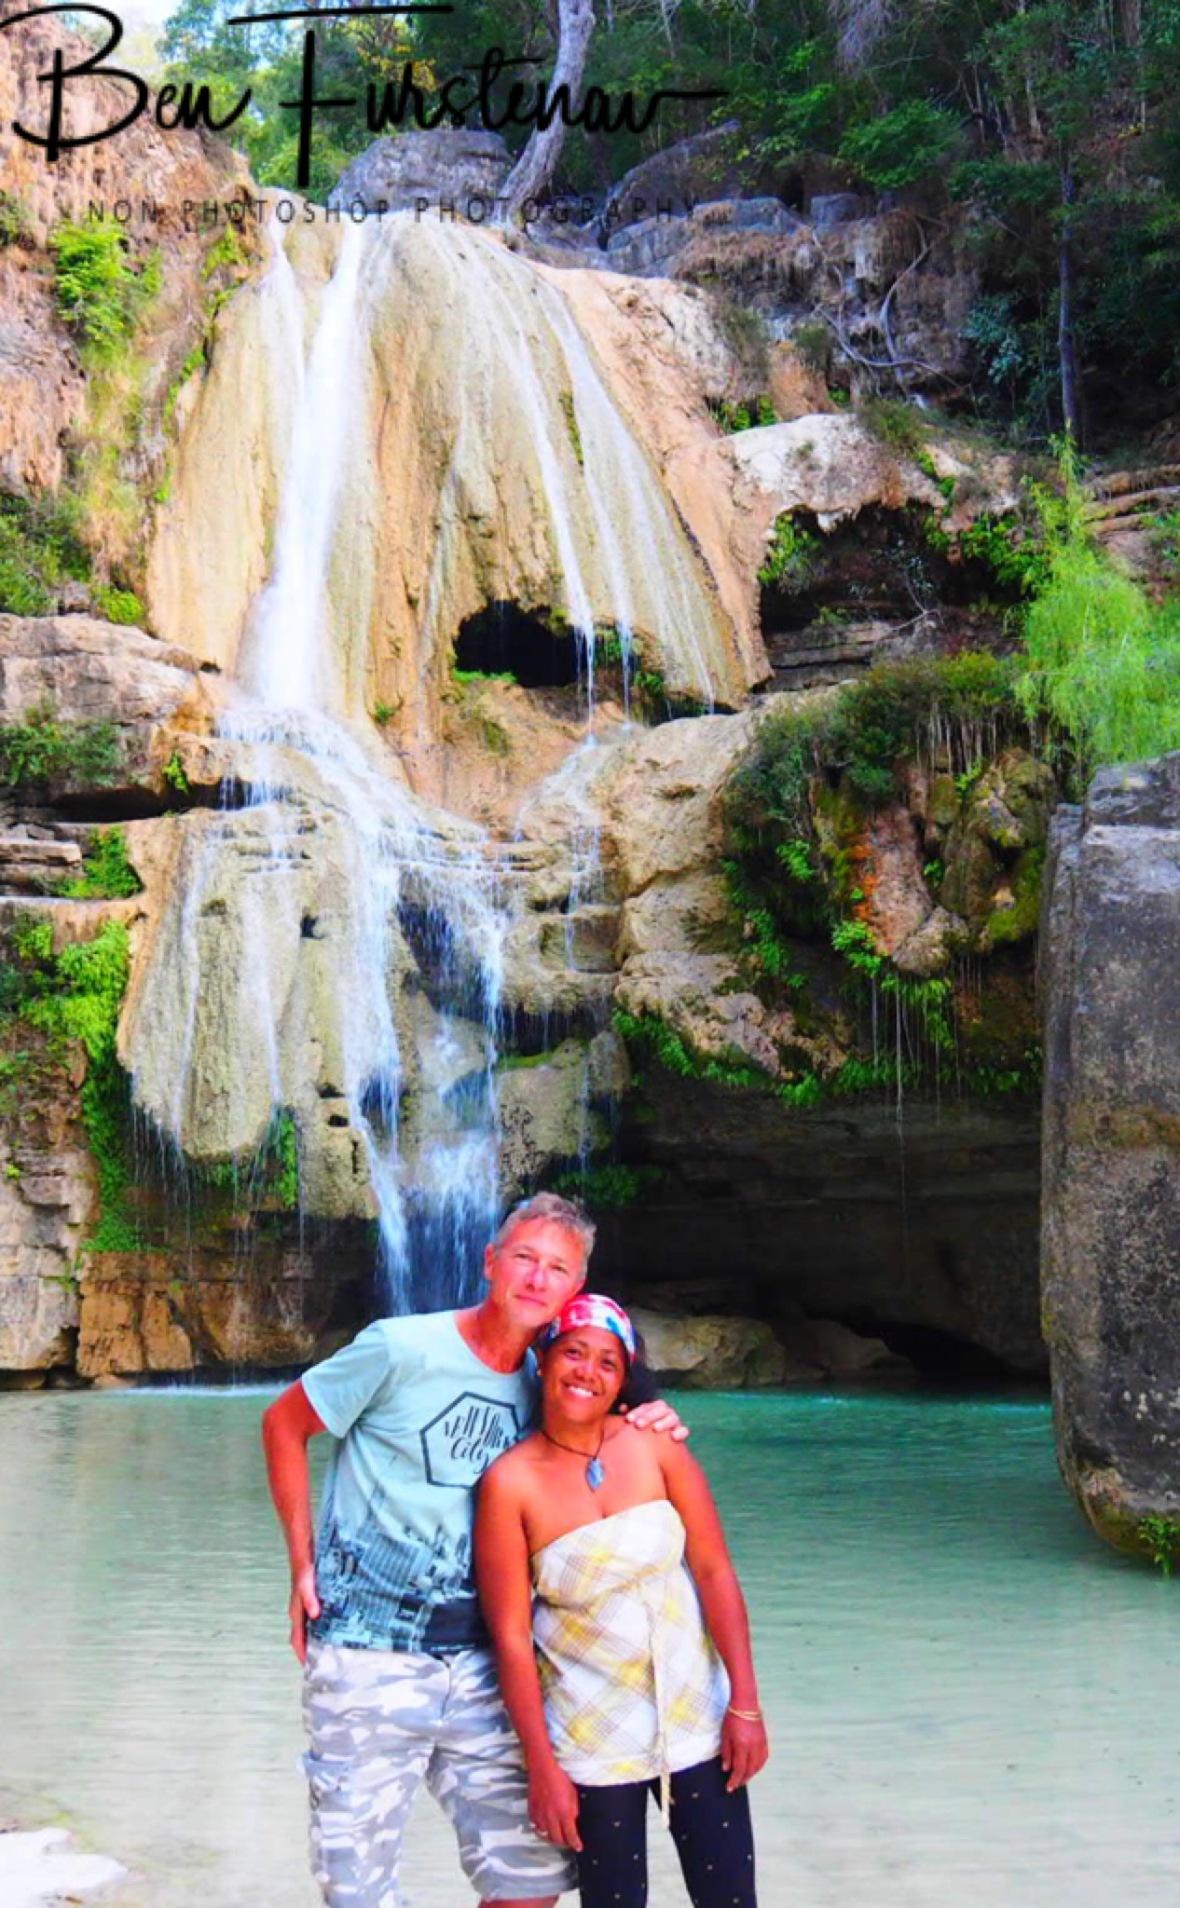 La cascades with Ninah Clara